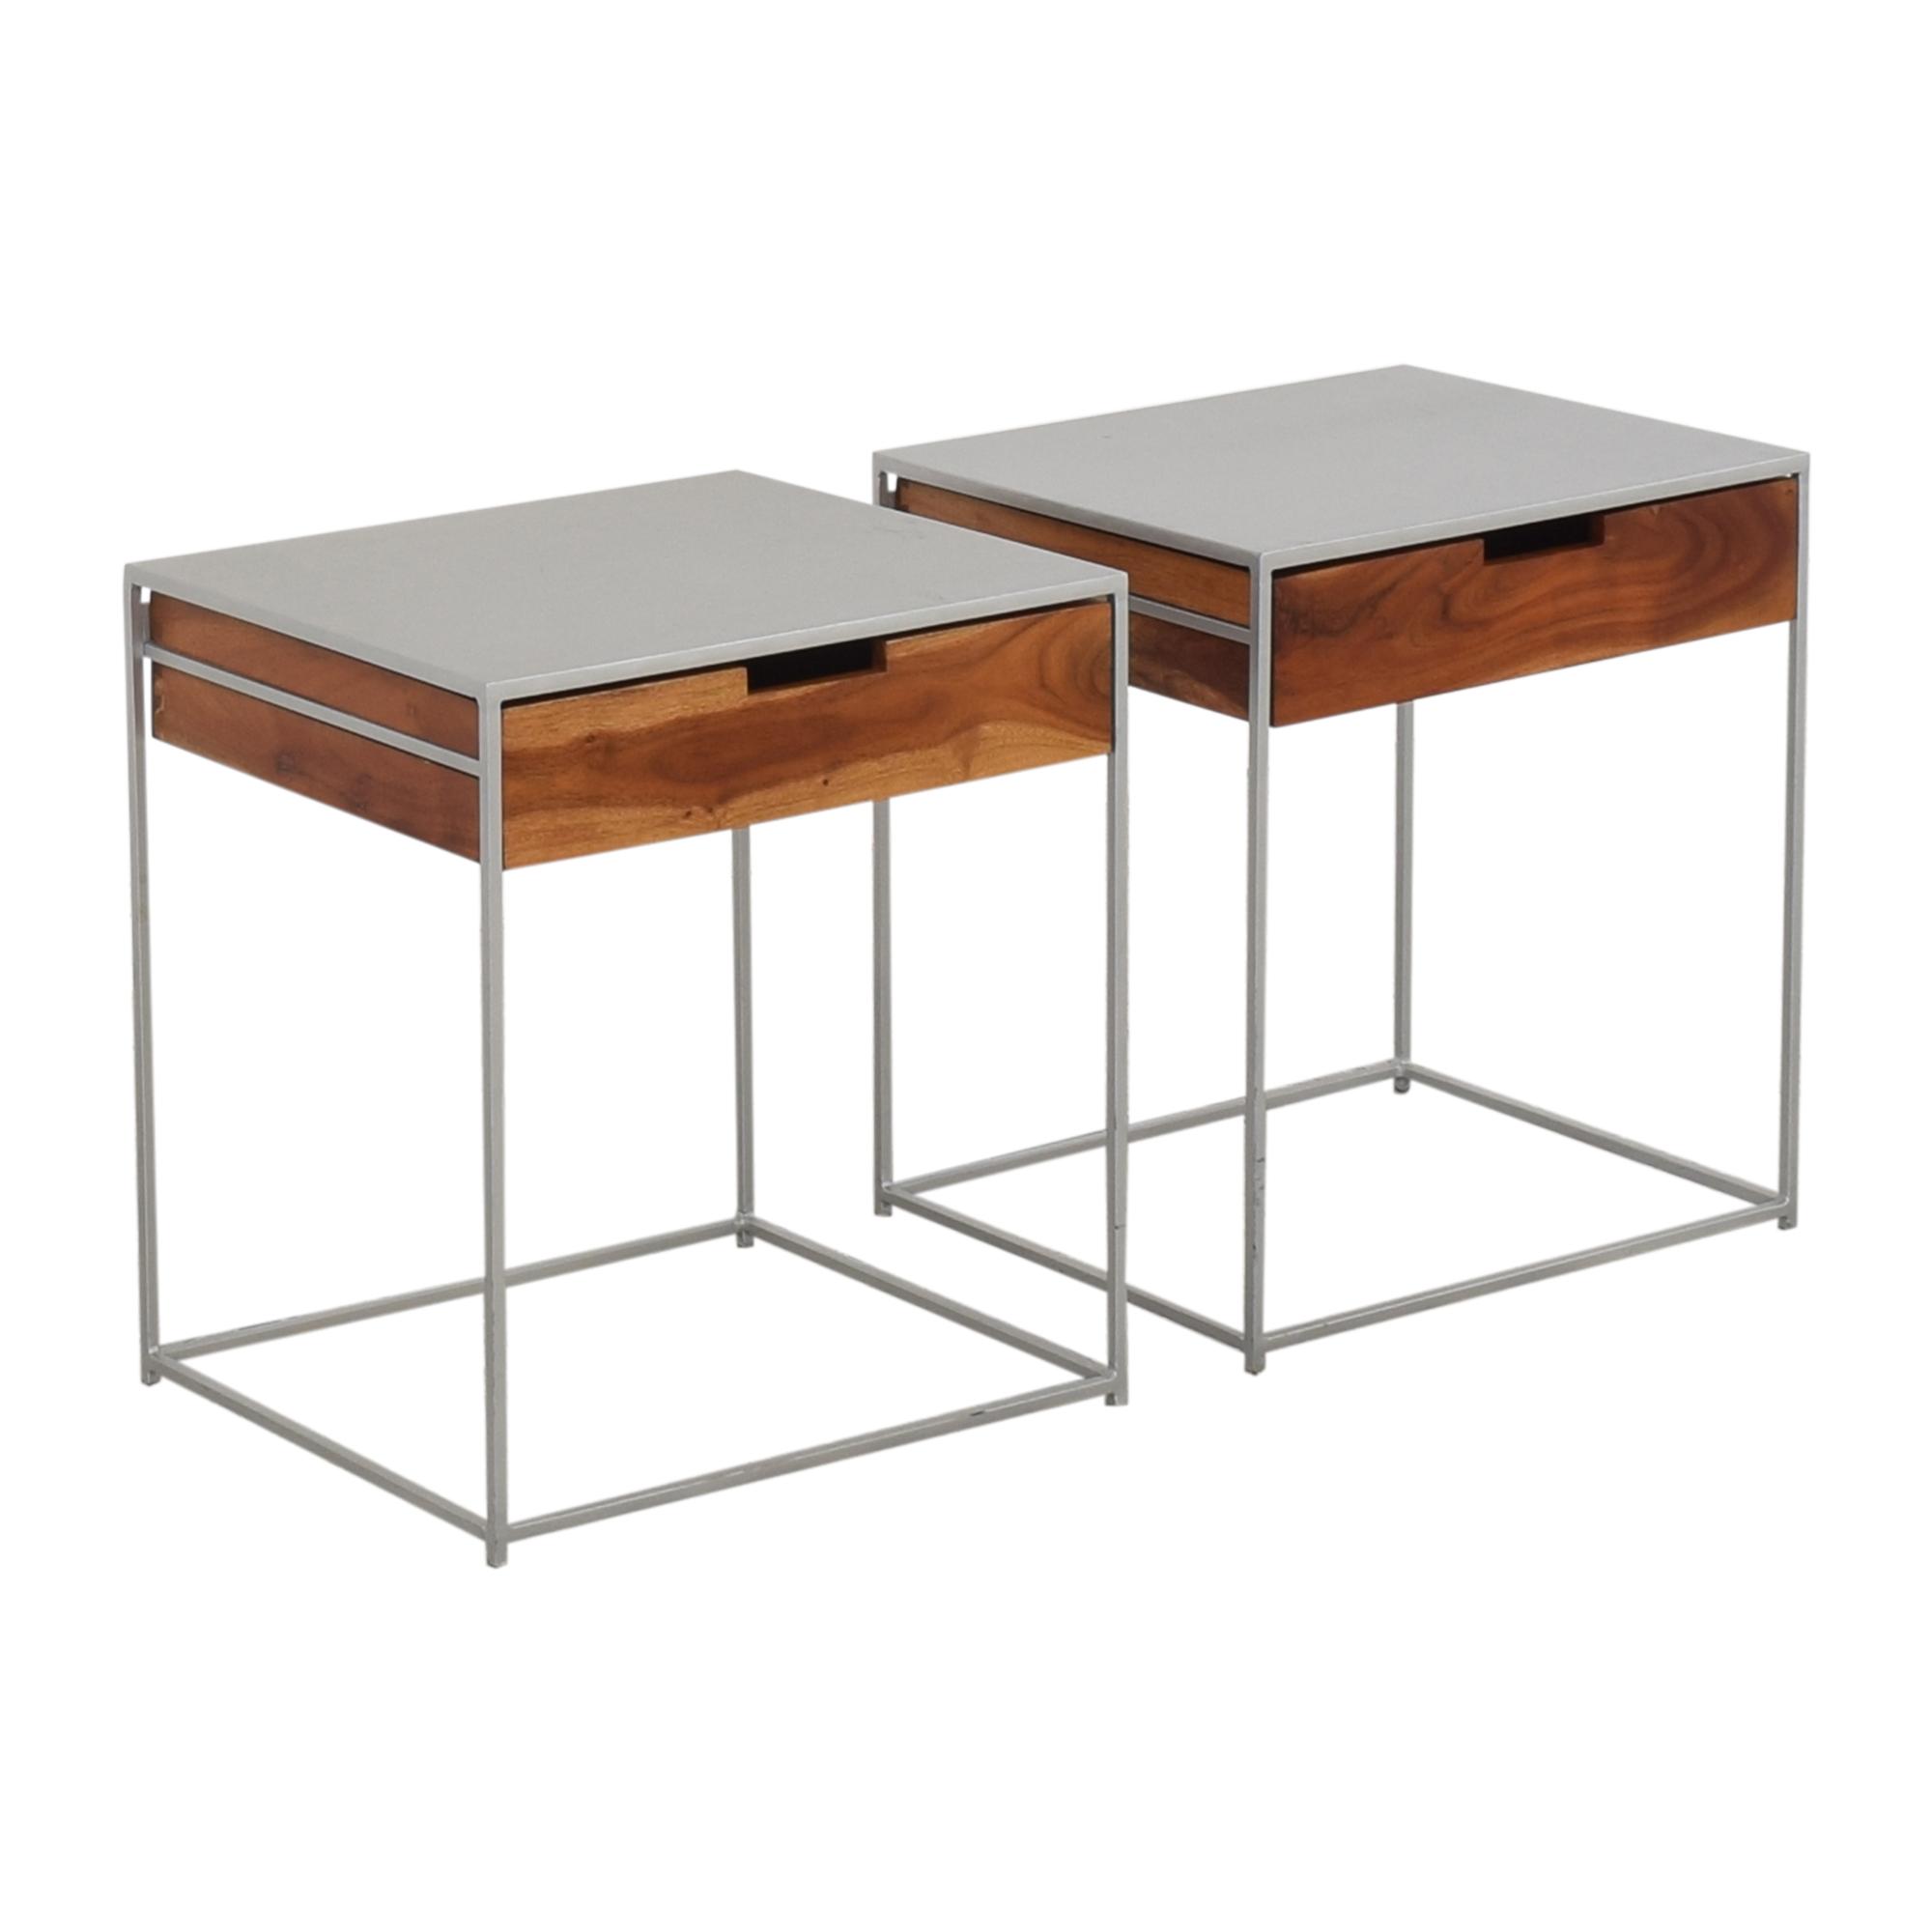 buy CB2 Audrey Nightstands CB2 Tables